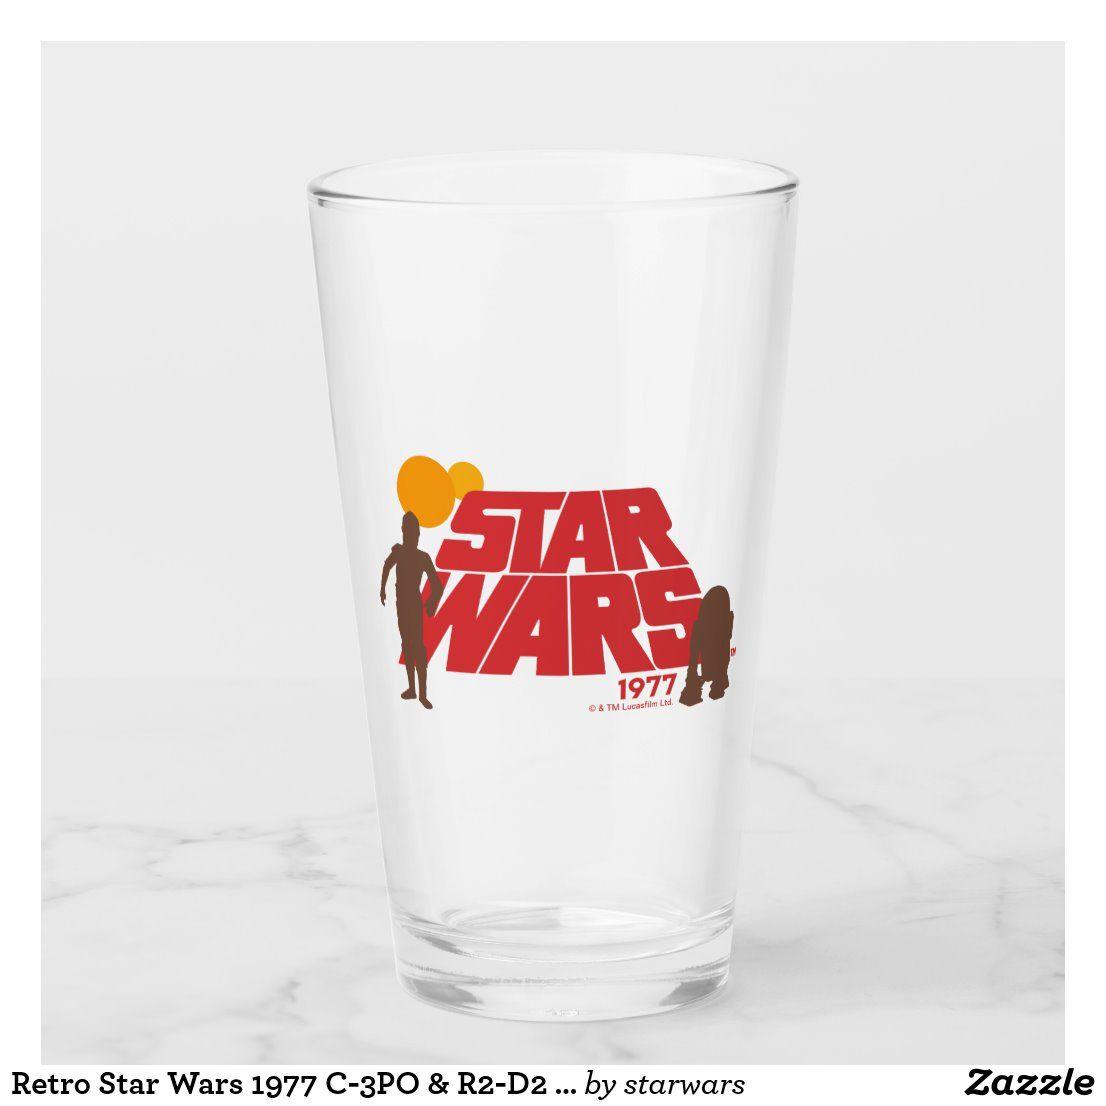 Retro Star Wars 1977 C 3po R2 D2 Logo Glass Zazzle Com In 2020 Star Wars 1977 Star Wars Merchandise Vintage Star Wars